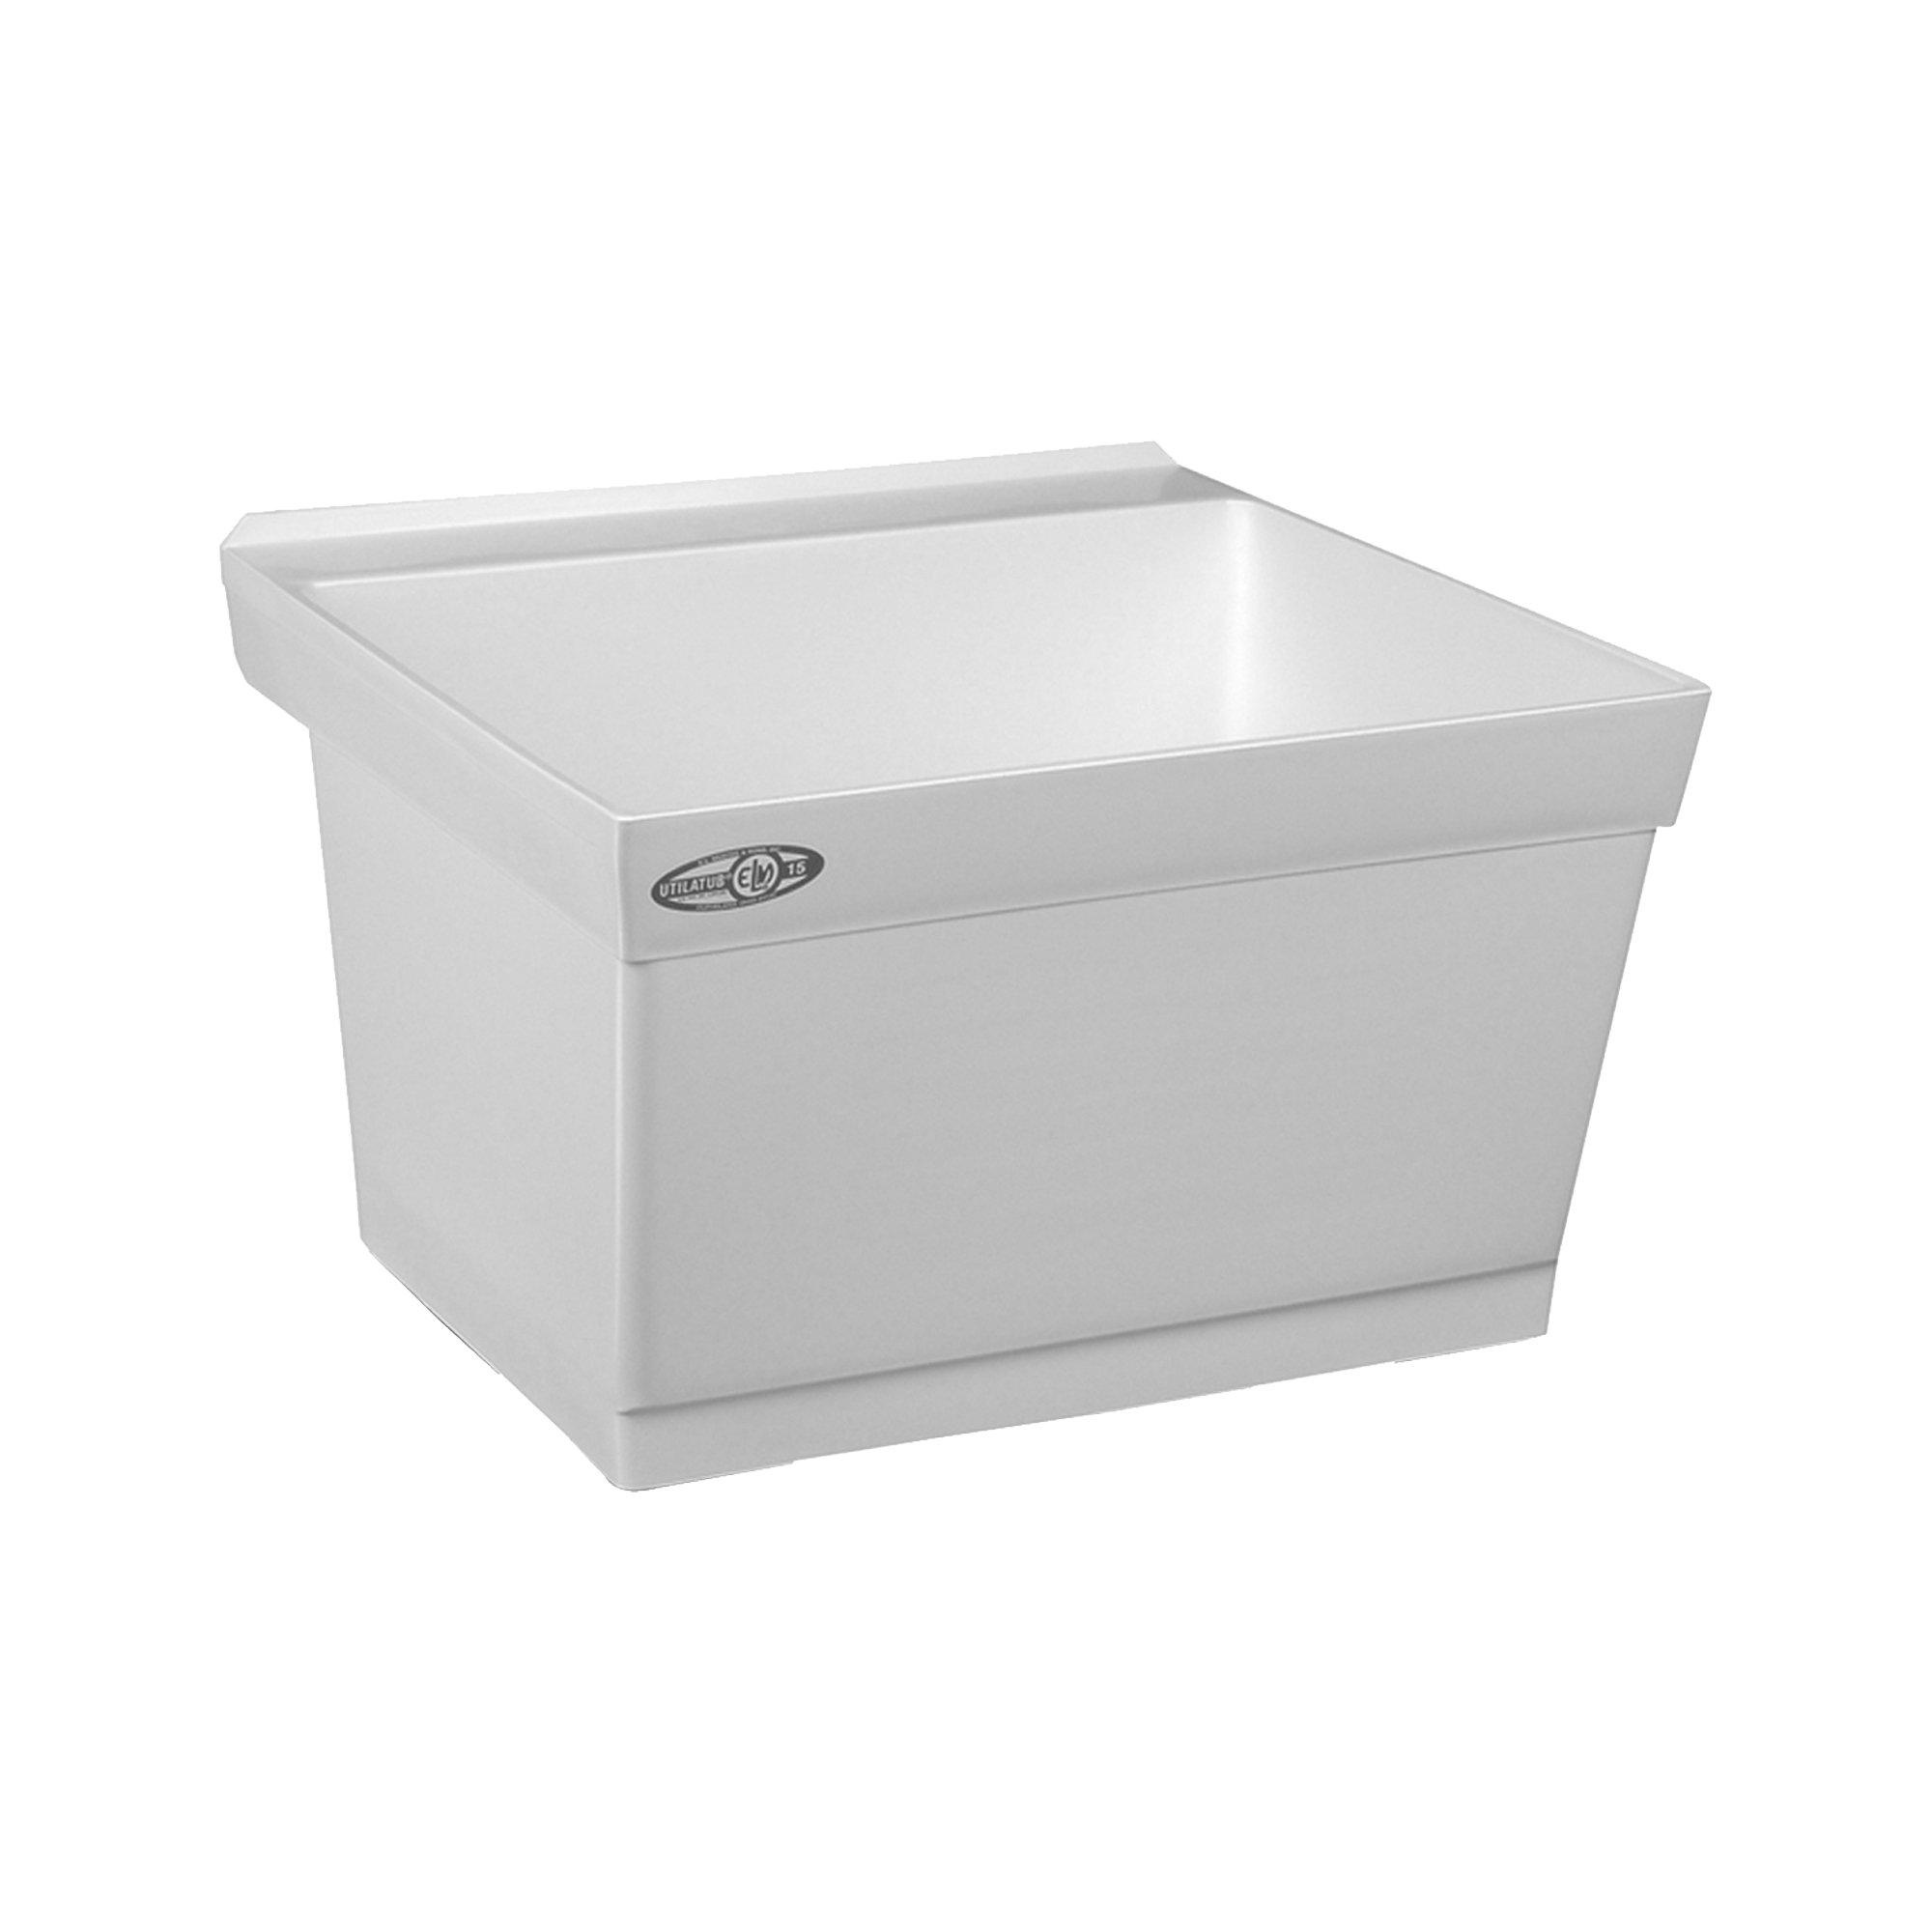 Mustee 15W Utilatub Laundry Tub Wall Mount, 23.5-Inch x 23-Inch, White